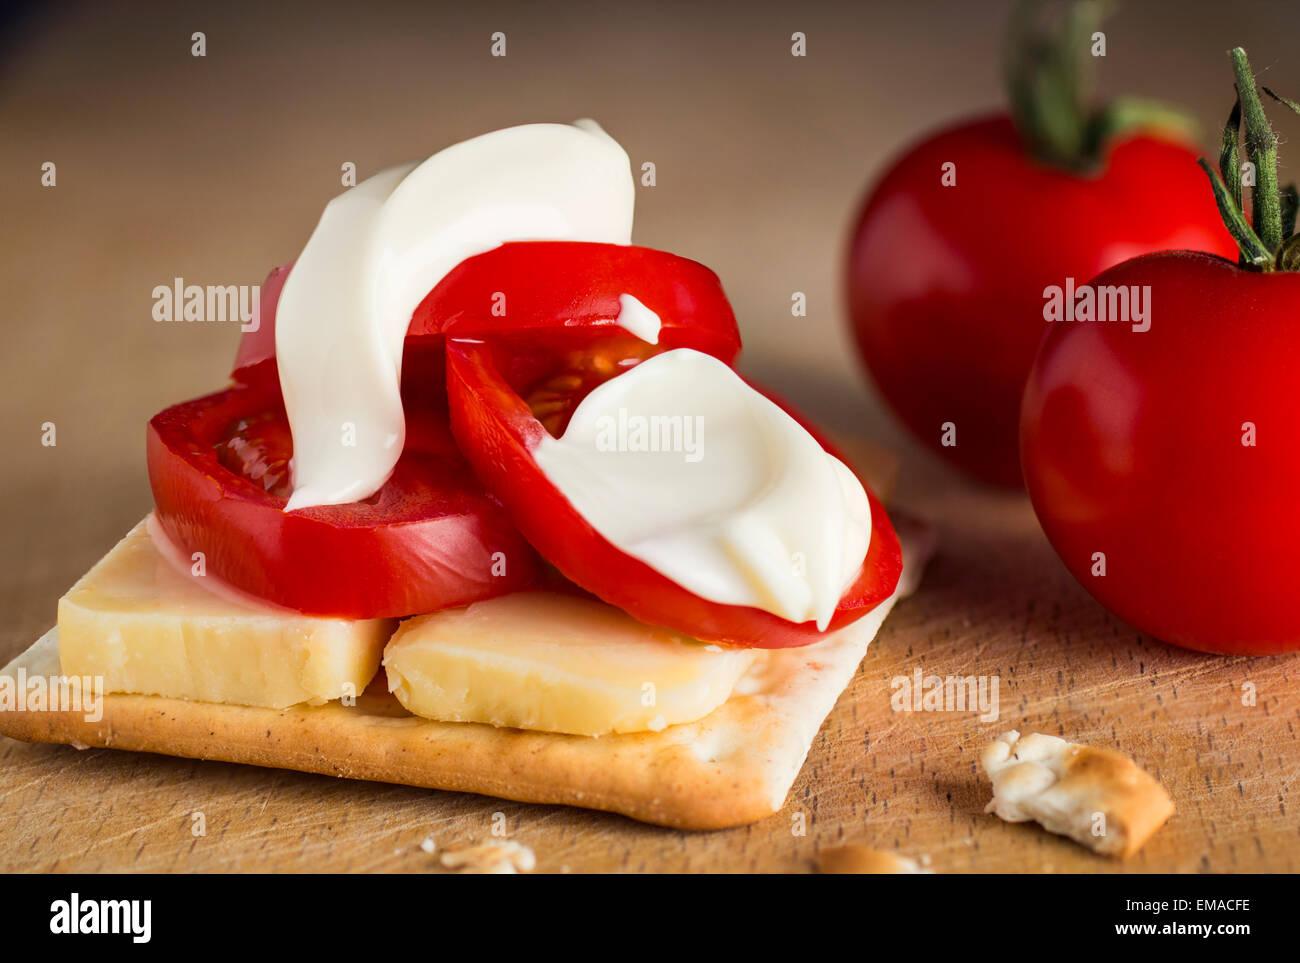 tomato cheese and mayonnaise ( mayo ) on cracker - Stock Image